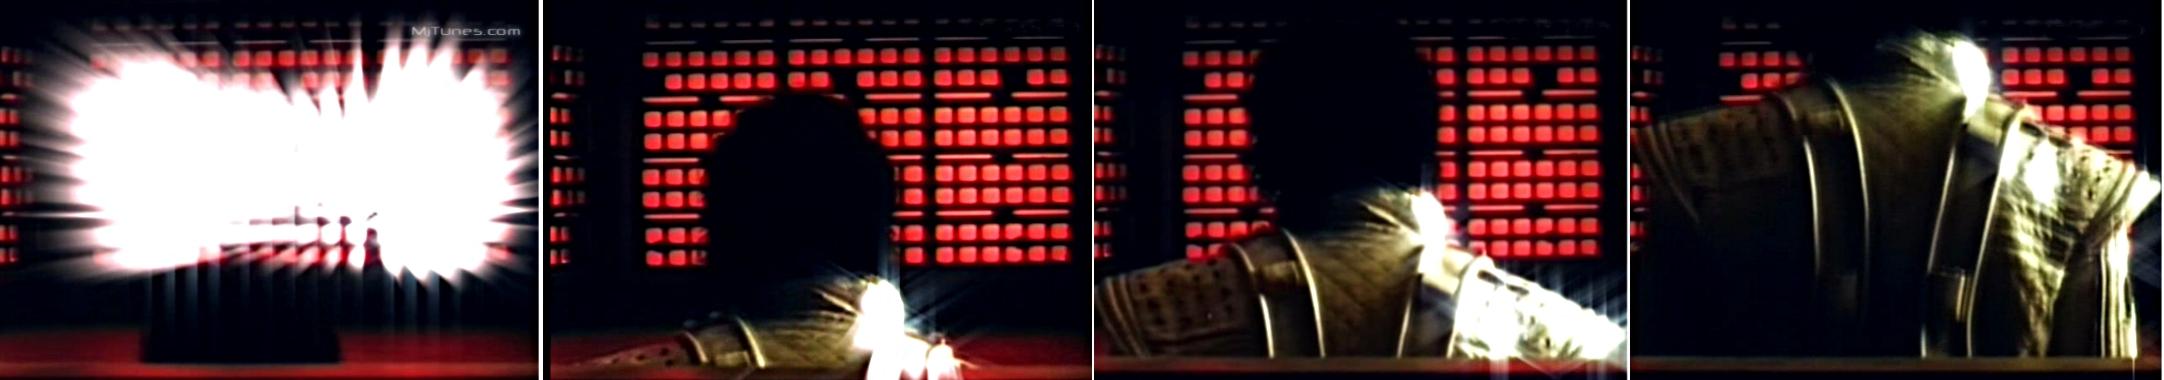 michael jackson dangerous album cover explained meaning erklärt symbols symbole bedeutung ryden art captain EO film disney